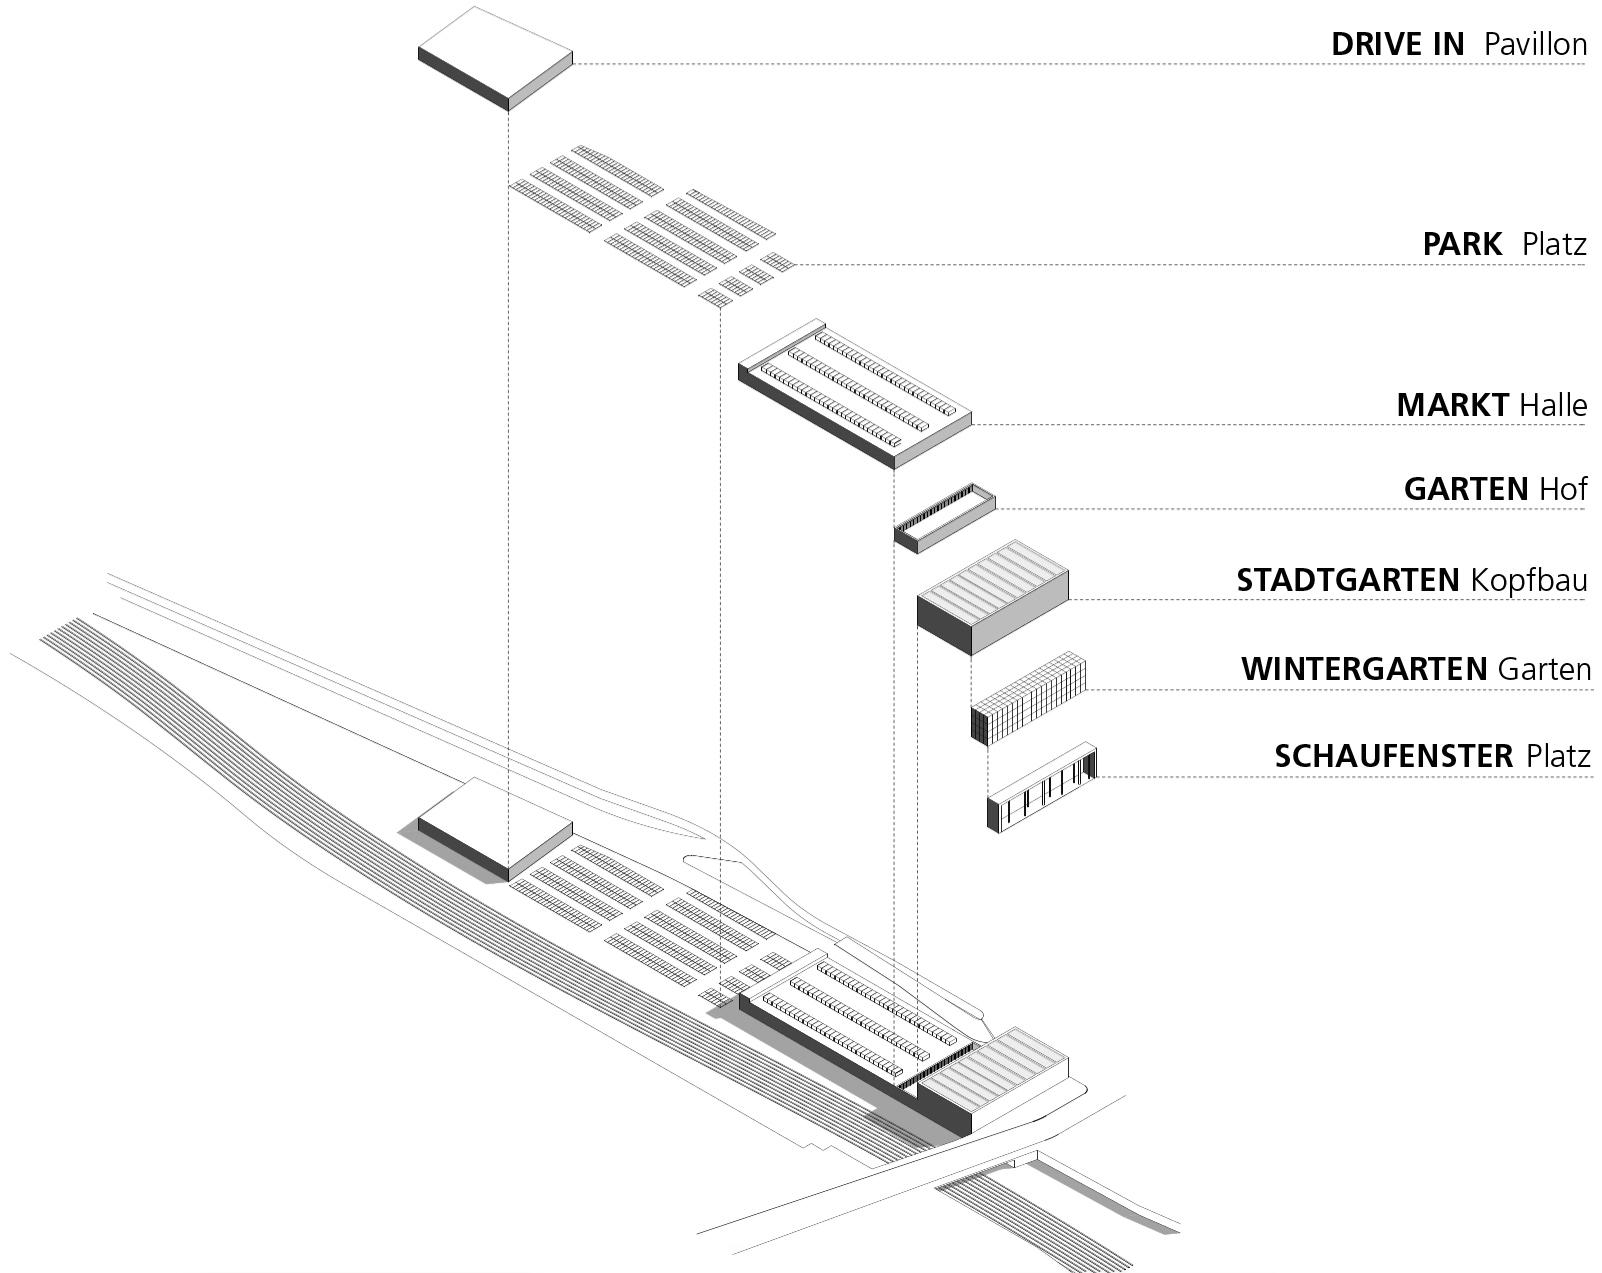 bauhaus berlin halensee fassade baumarkt drivein mller. Black Bedroom Furniture Sets. Home Design Ideas